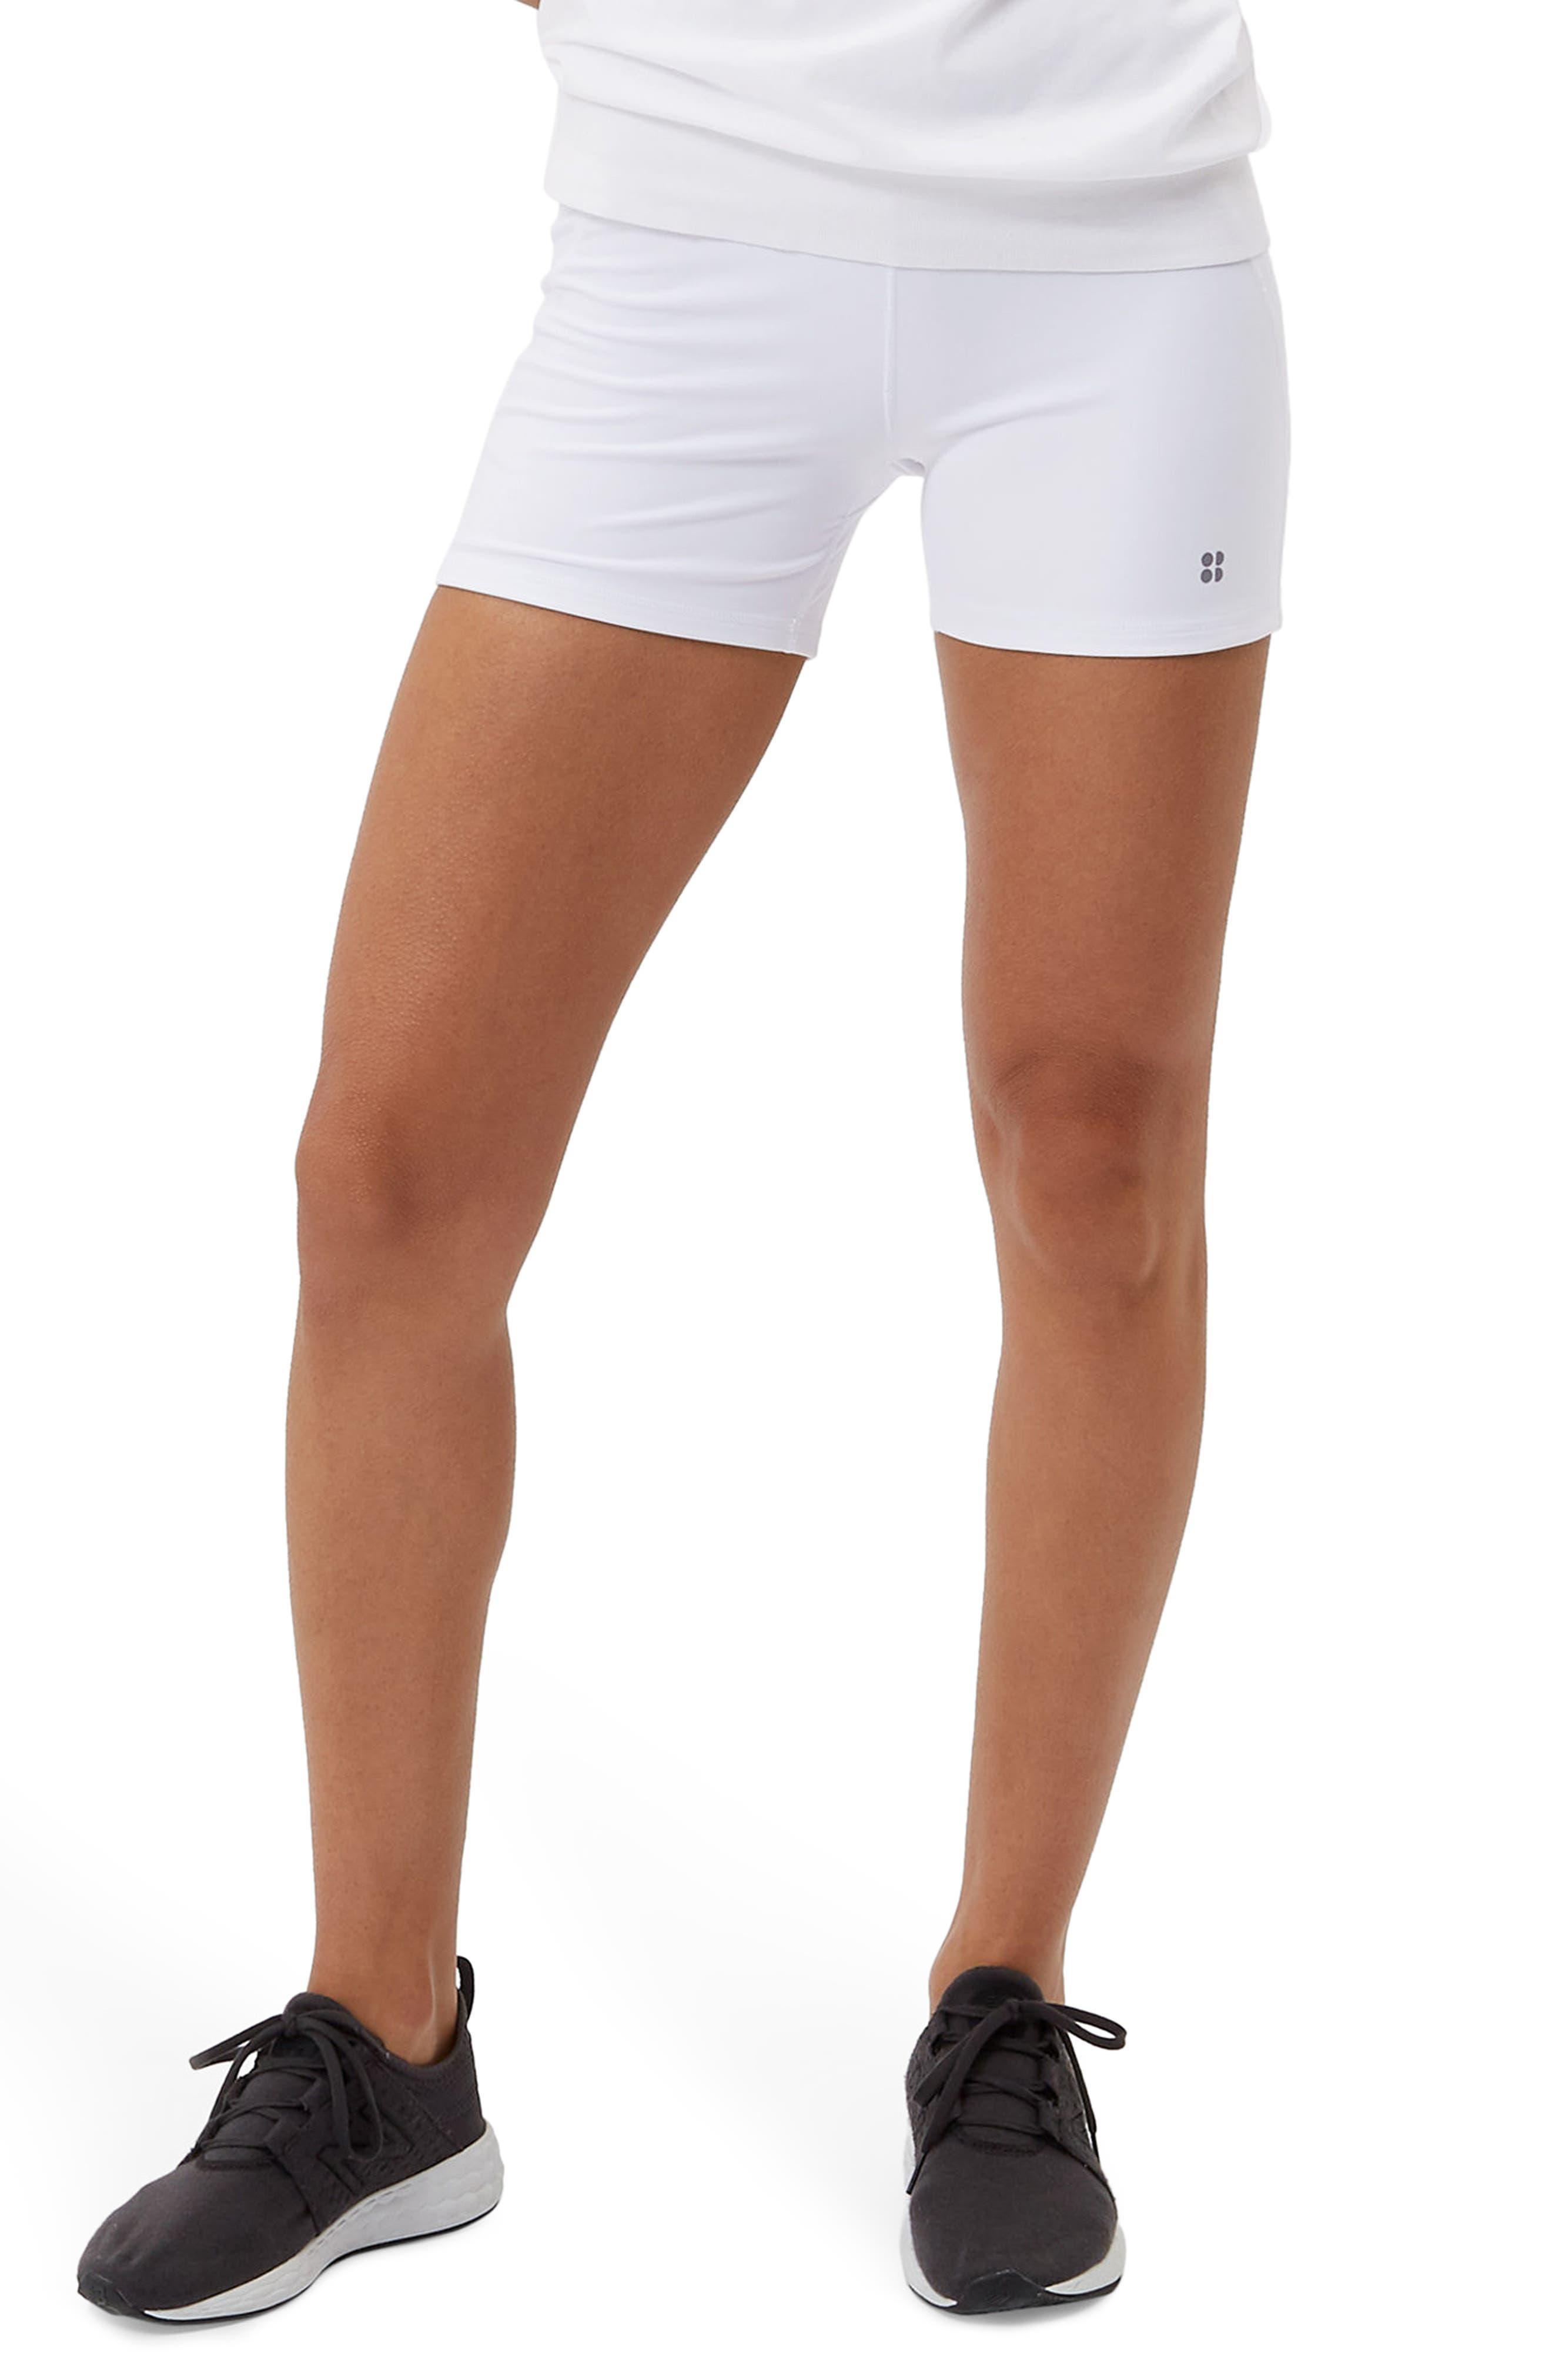 Power Shorts,                         Main,                         color, 100